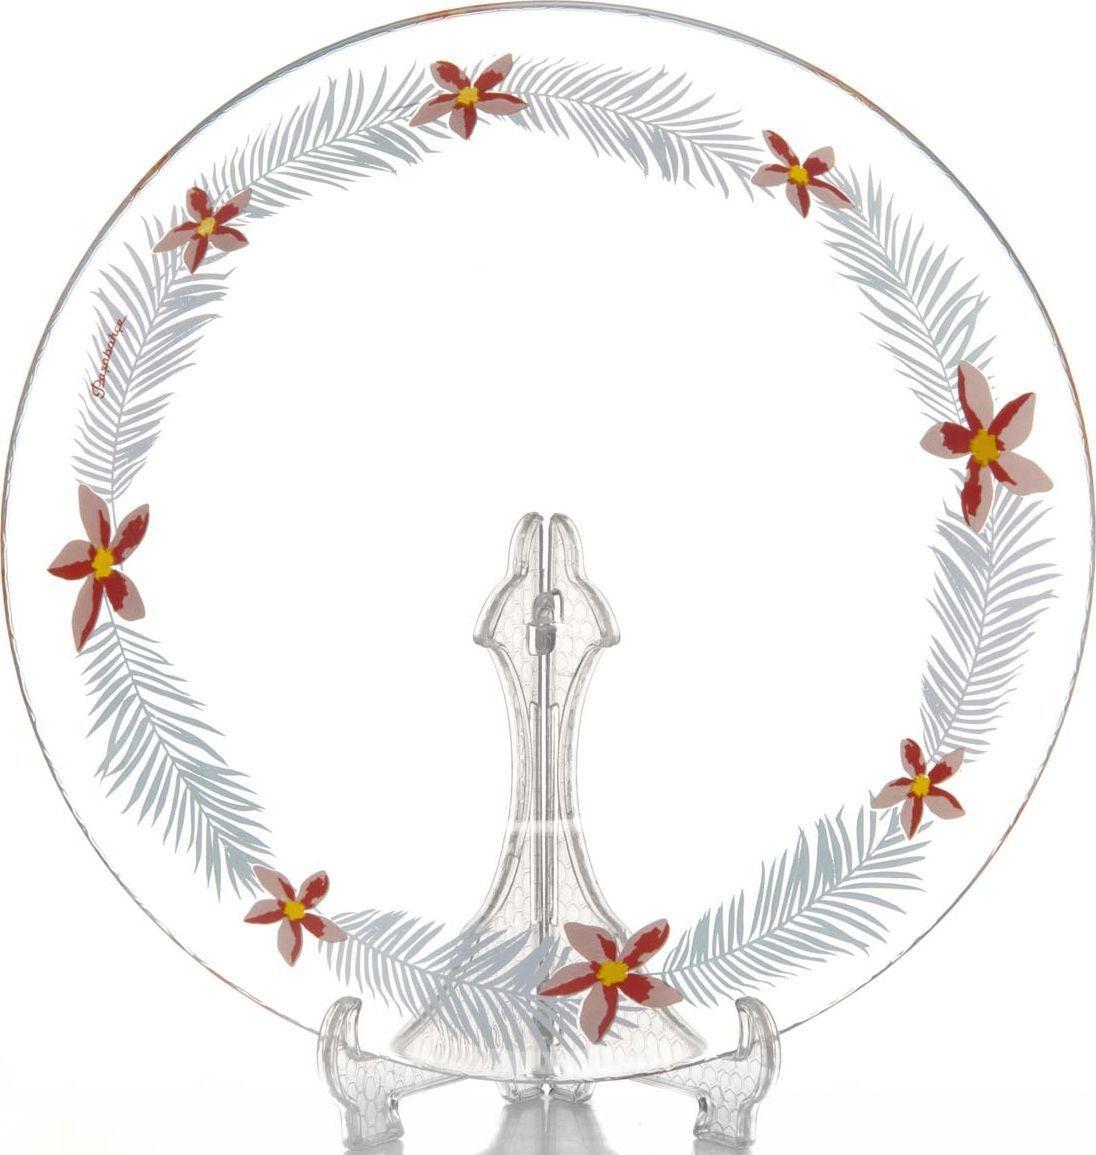 Тарелка глубокая Pasabahce Тропик, диаметр 22 см тарелка глубокая chinbull грация диаметр 23 см